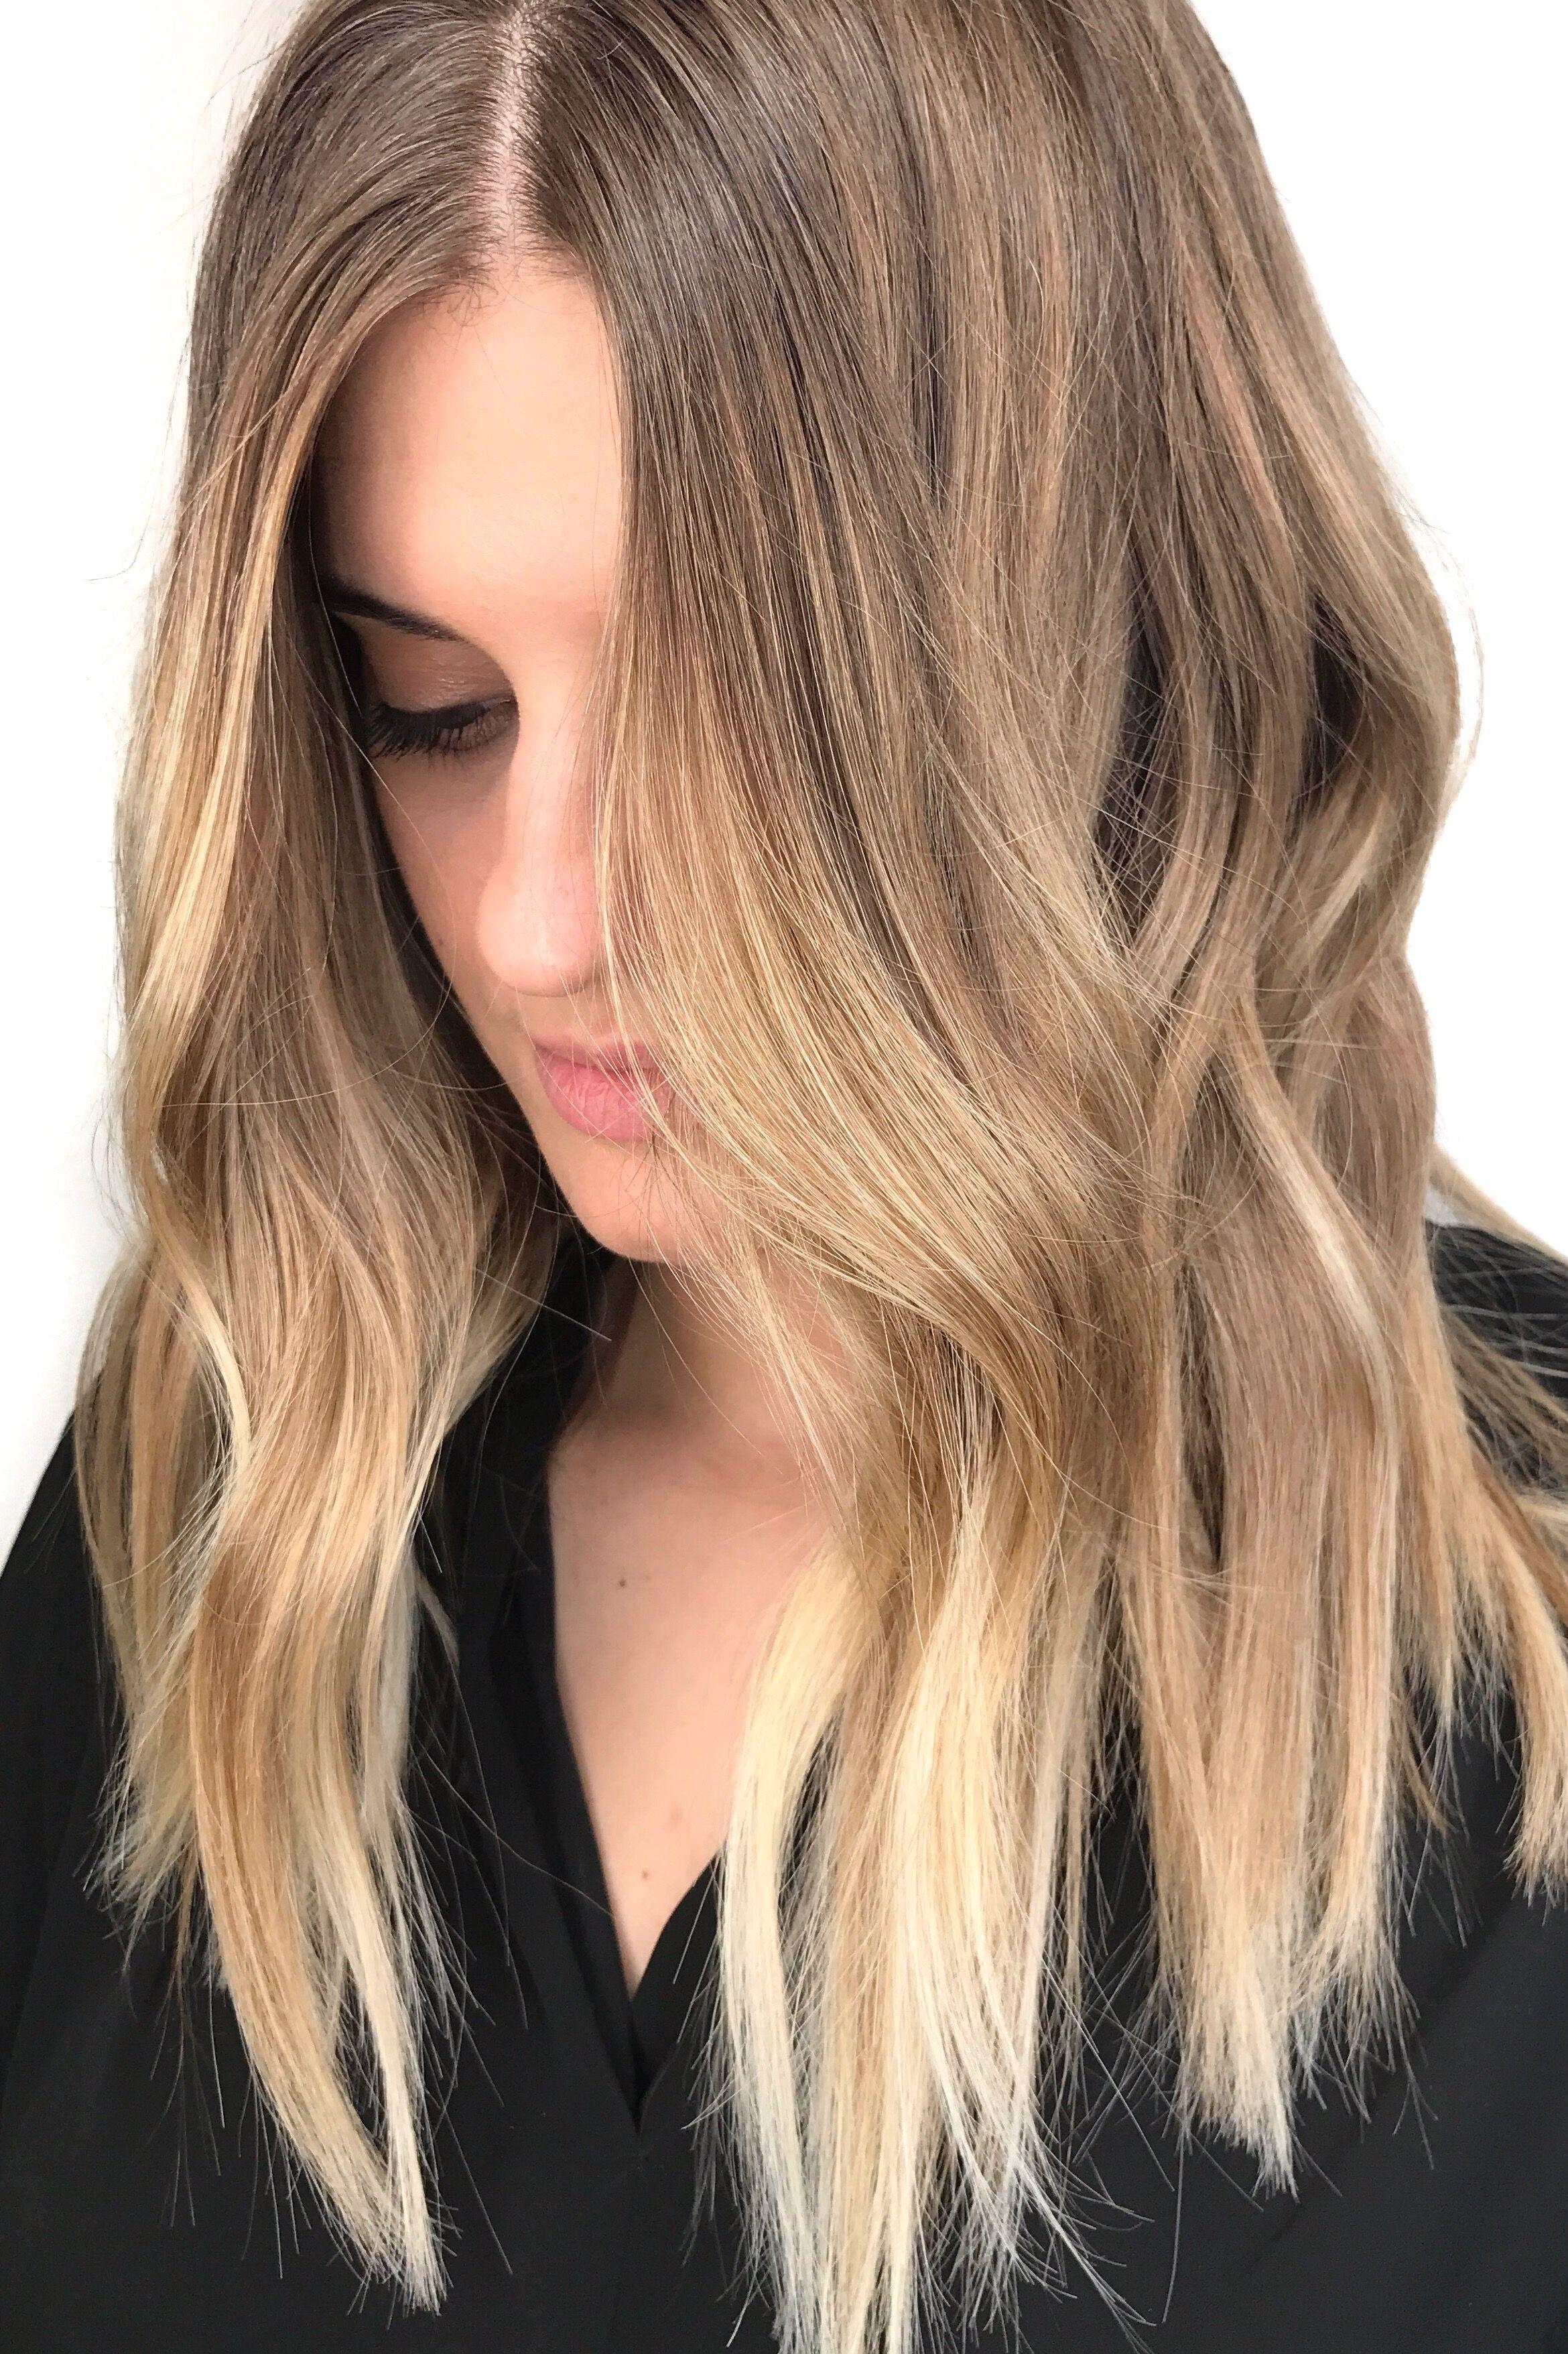 blonde balayage ; natural blonde highlights ; sun kissed hair color ...